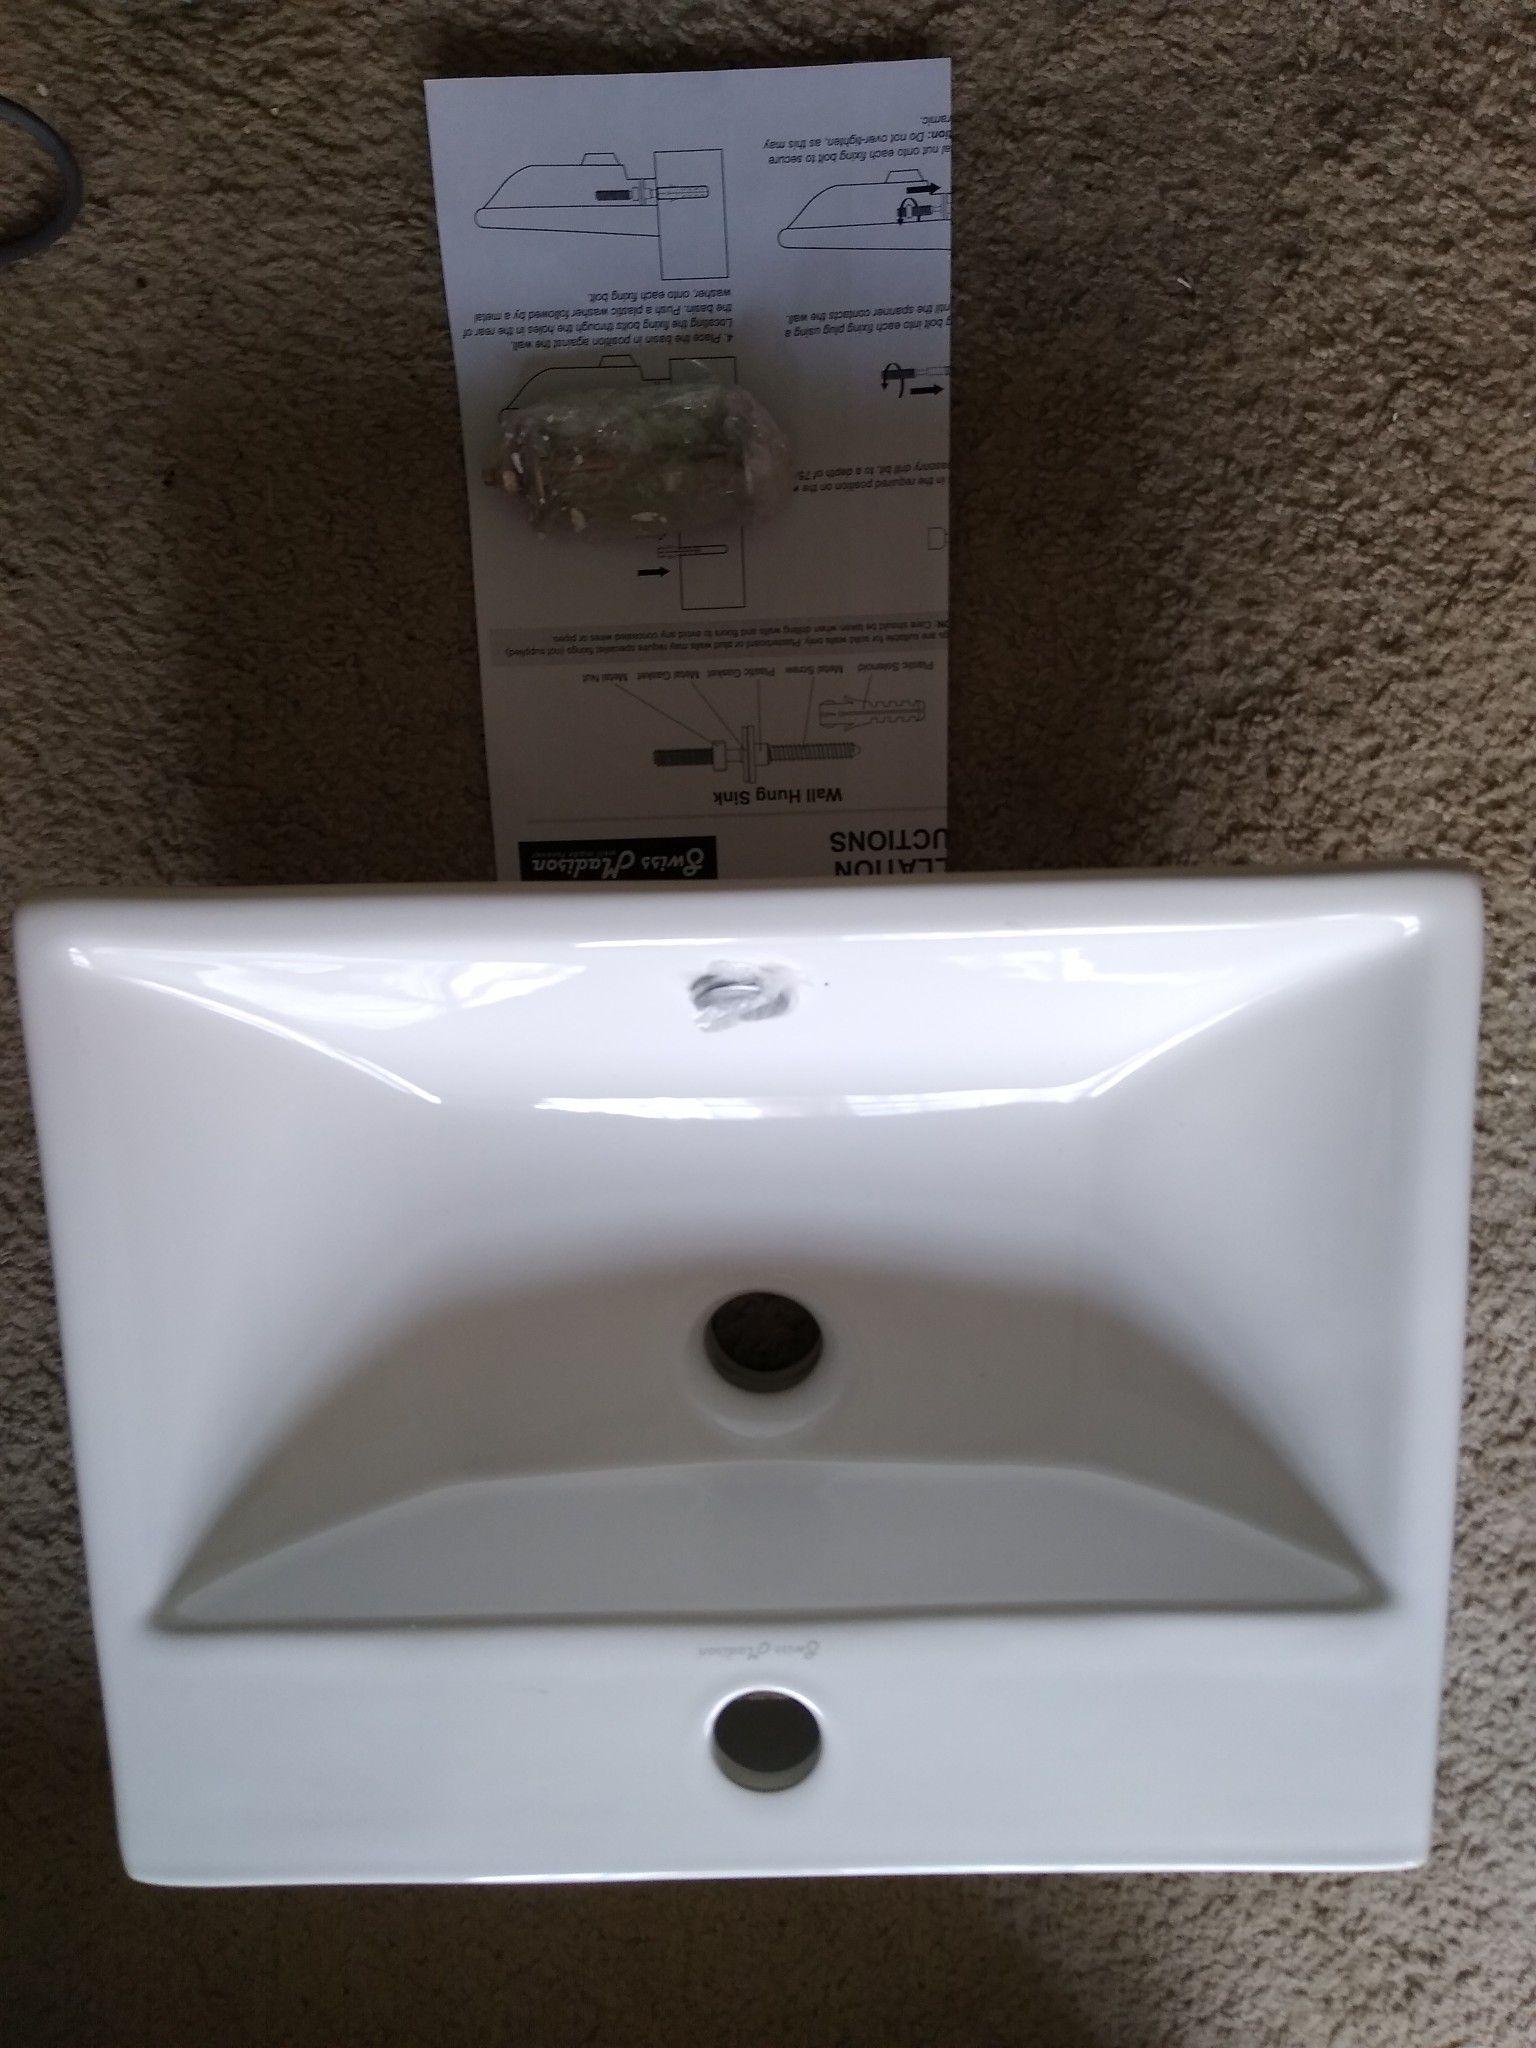 High gloss bathroom sink new open box